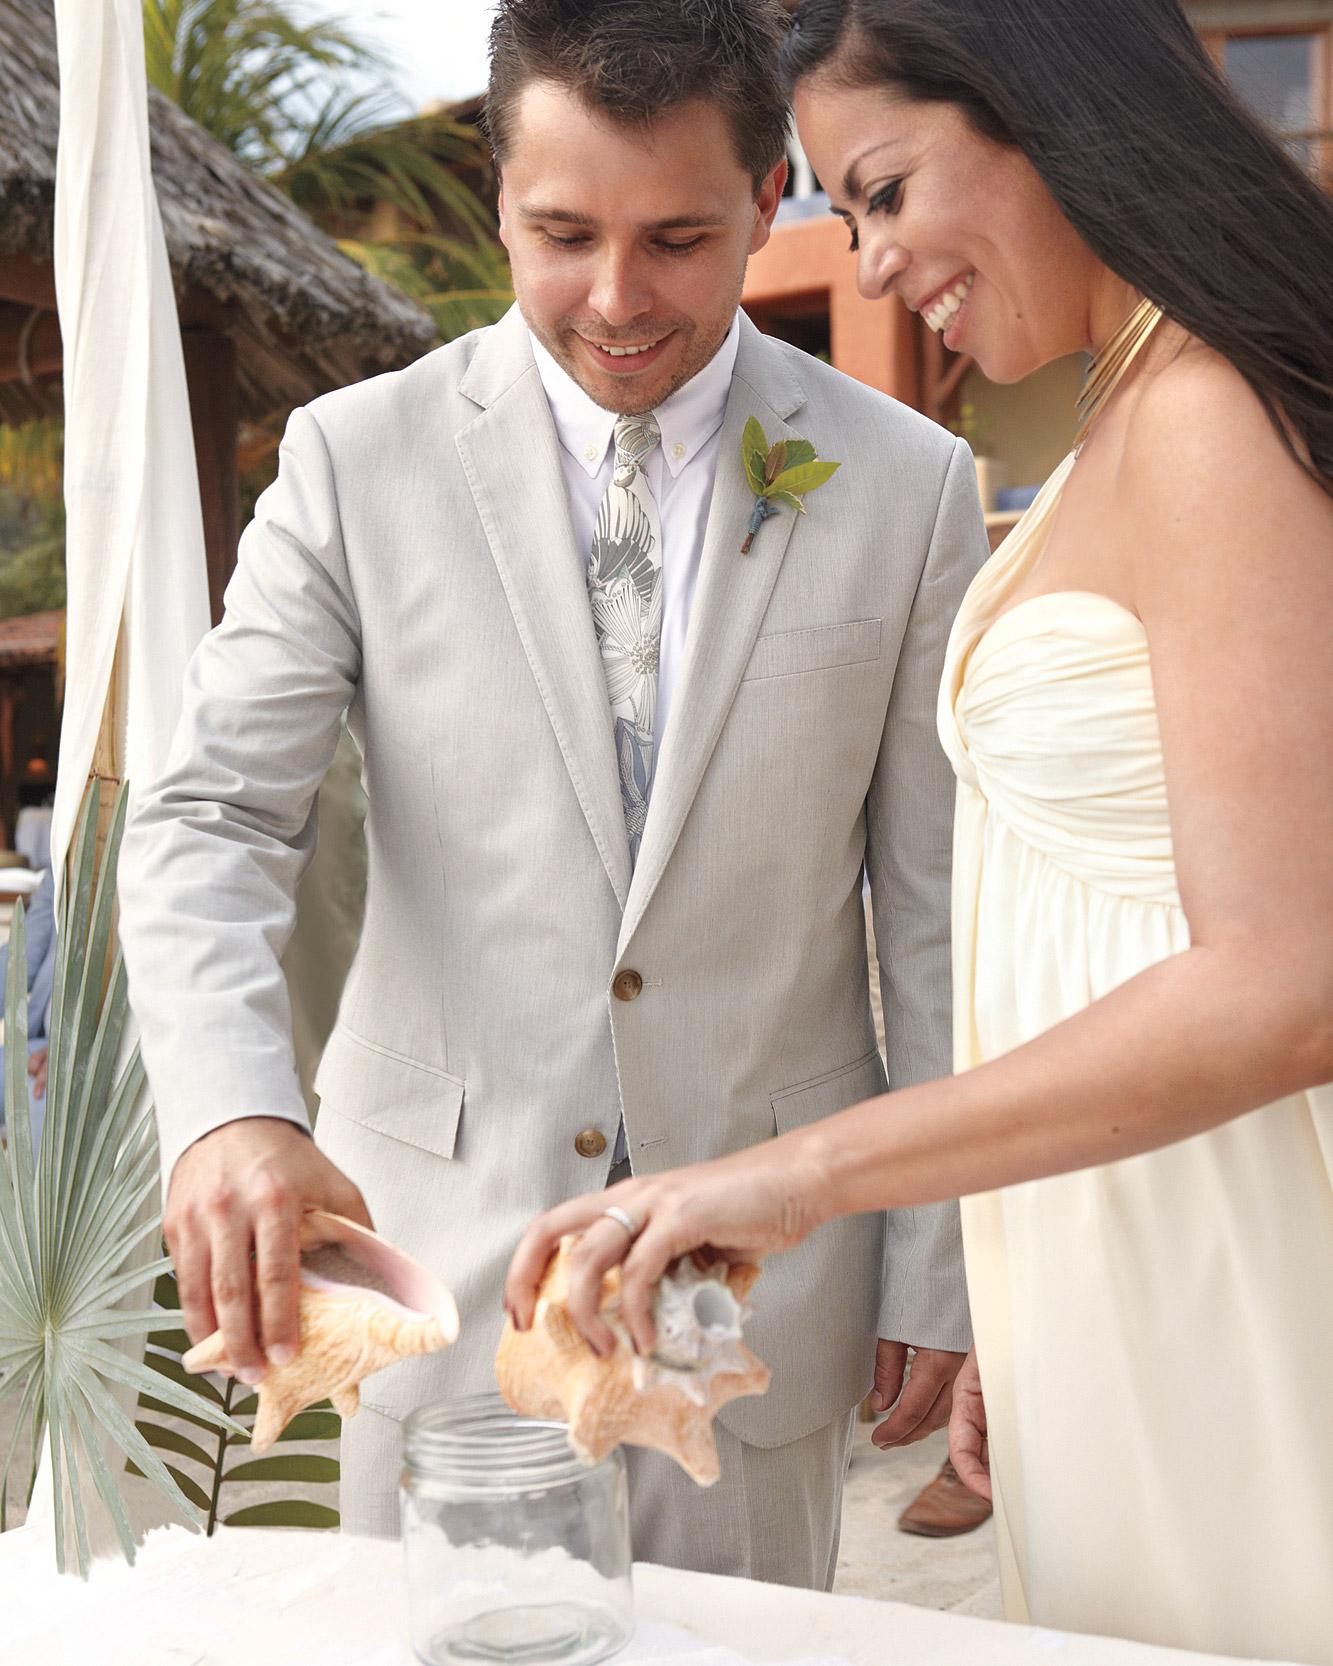 rw-mexico-bride-groom-mwds107779.jpg